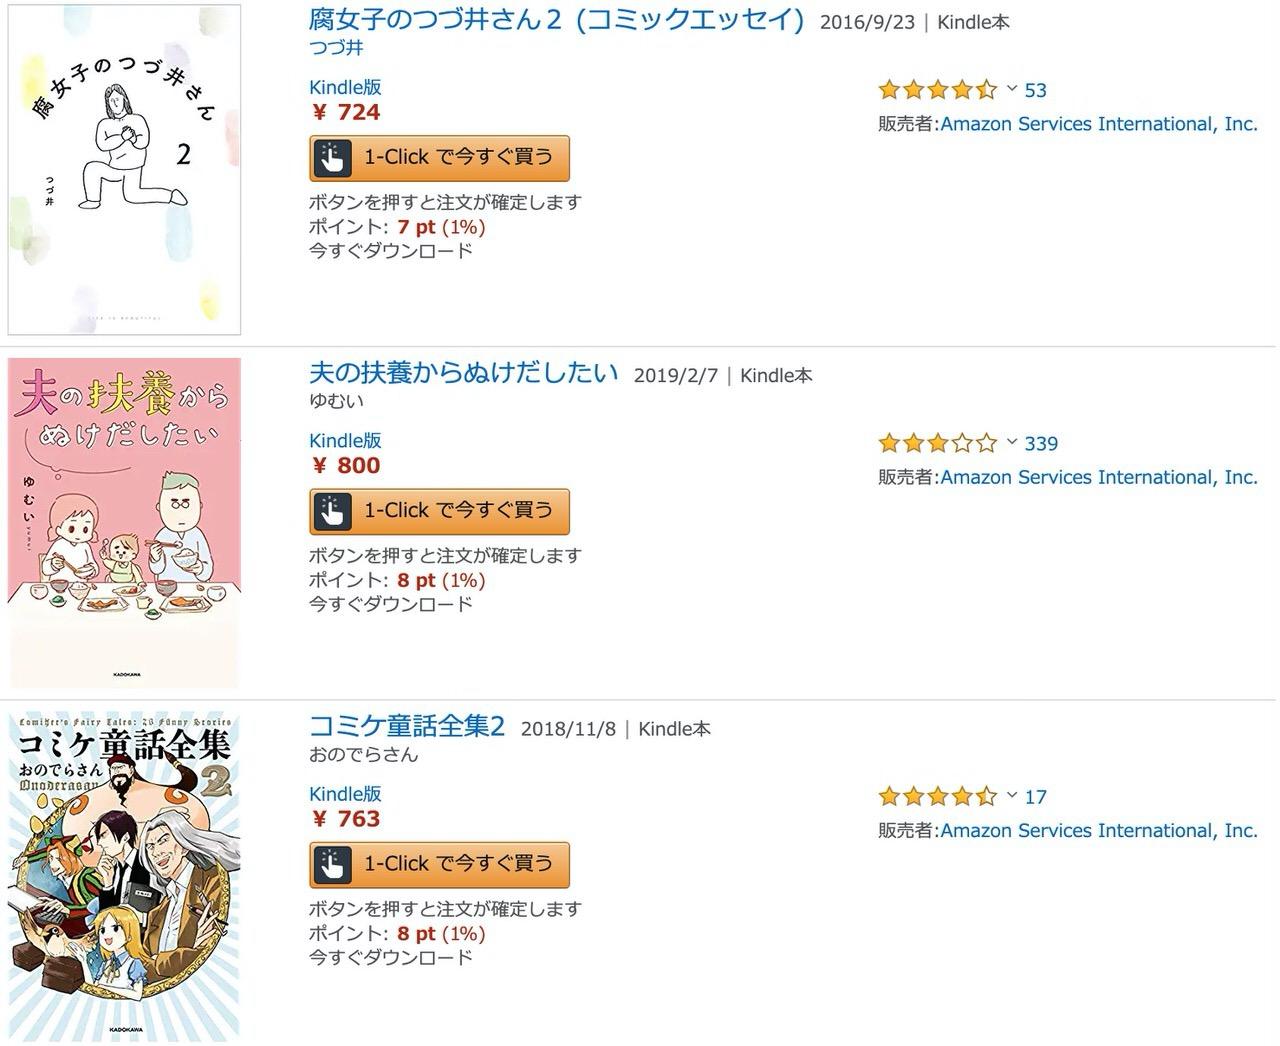 【Kindleセール】腐女子のつづ井さん、コミケ童話全集、ある日突然オタクの夫が亡くなったら?など最大50%OFF「KADOKAWAコミックエッセイフェア」(11/21まで)